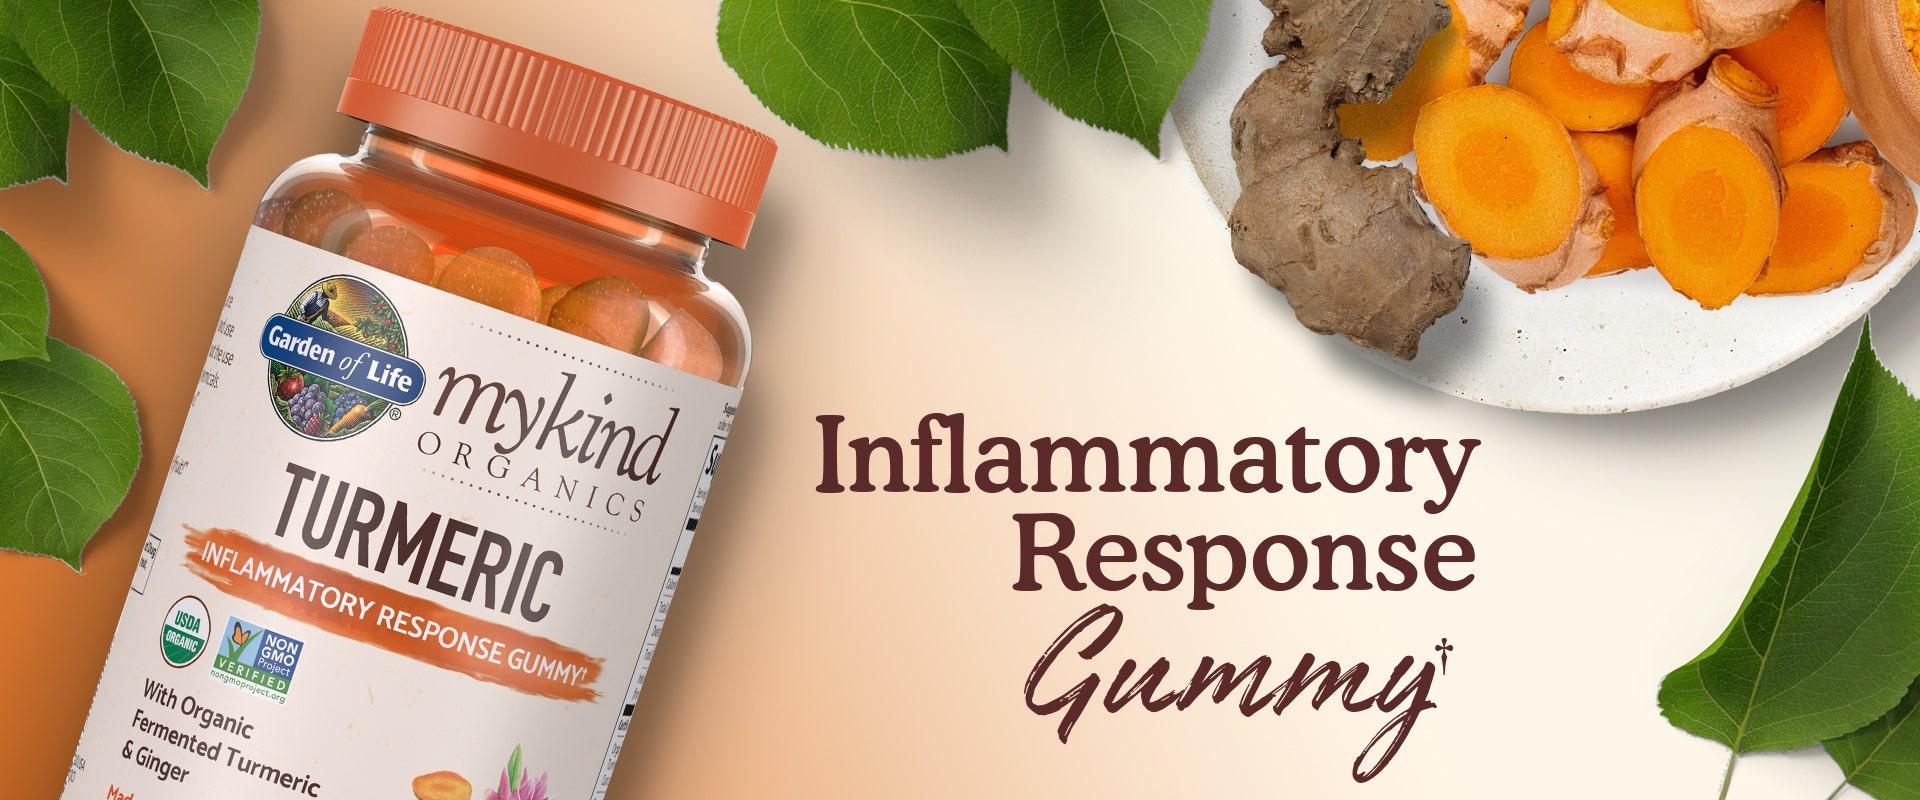 turmeric gummy vitamin mykind by garden of life